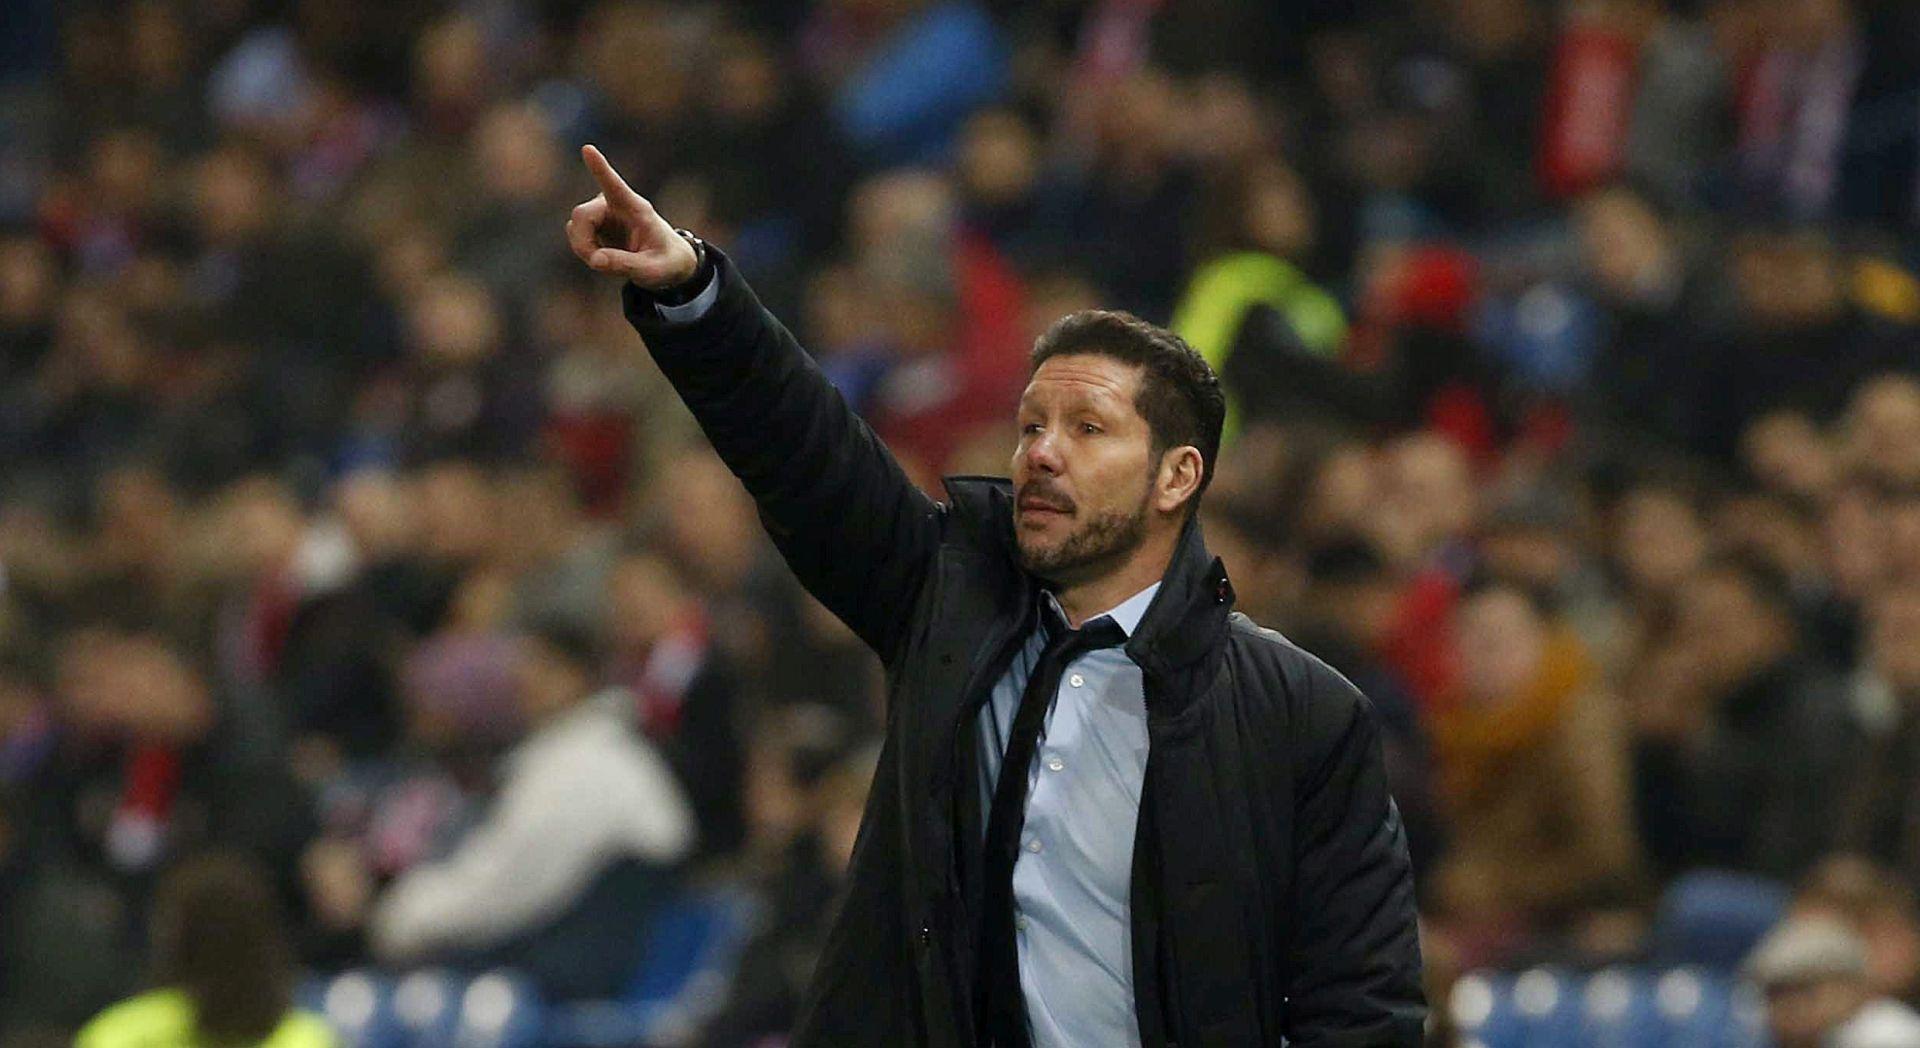 Simeone dogovorio prelazak u Chelsea